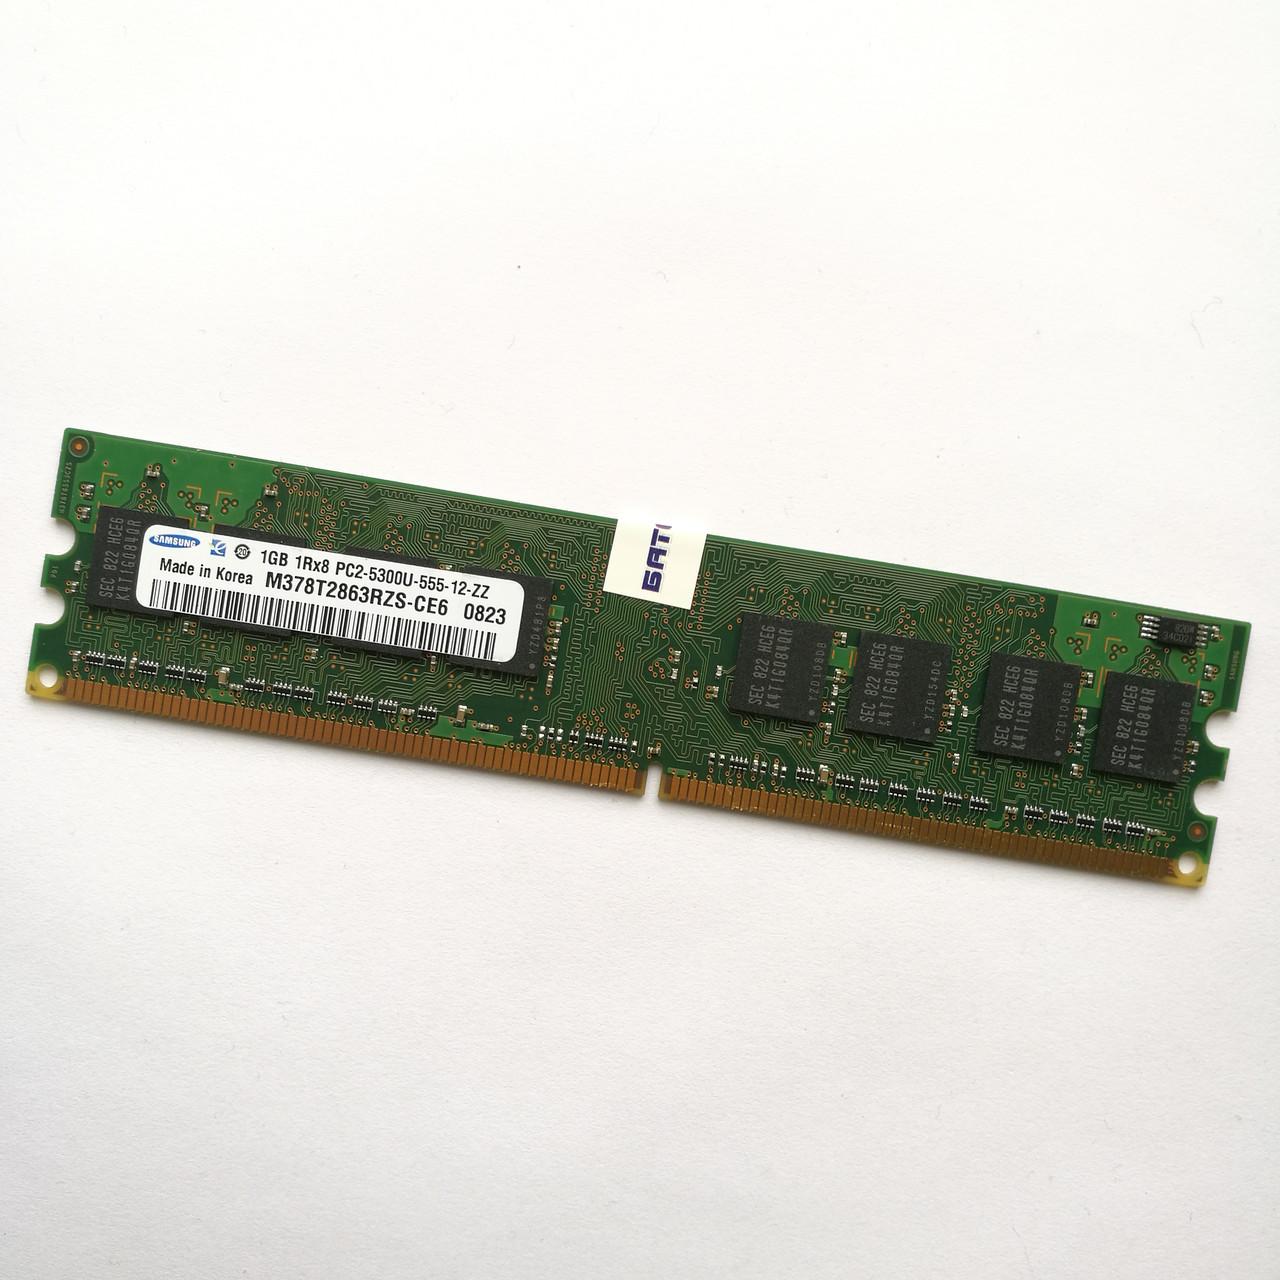 Оперативная память Samsung DDR2 1Gb 667MHz PC2 5300U 1R8 CL5 (M378T2863RZS-CE6) Б/У